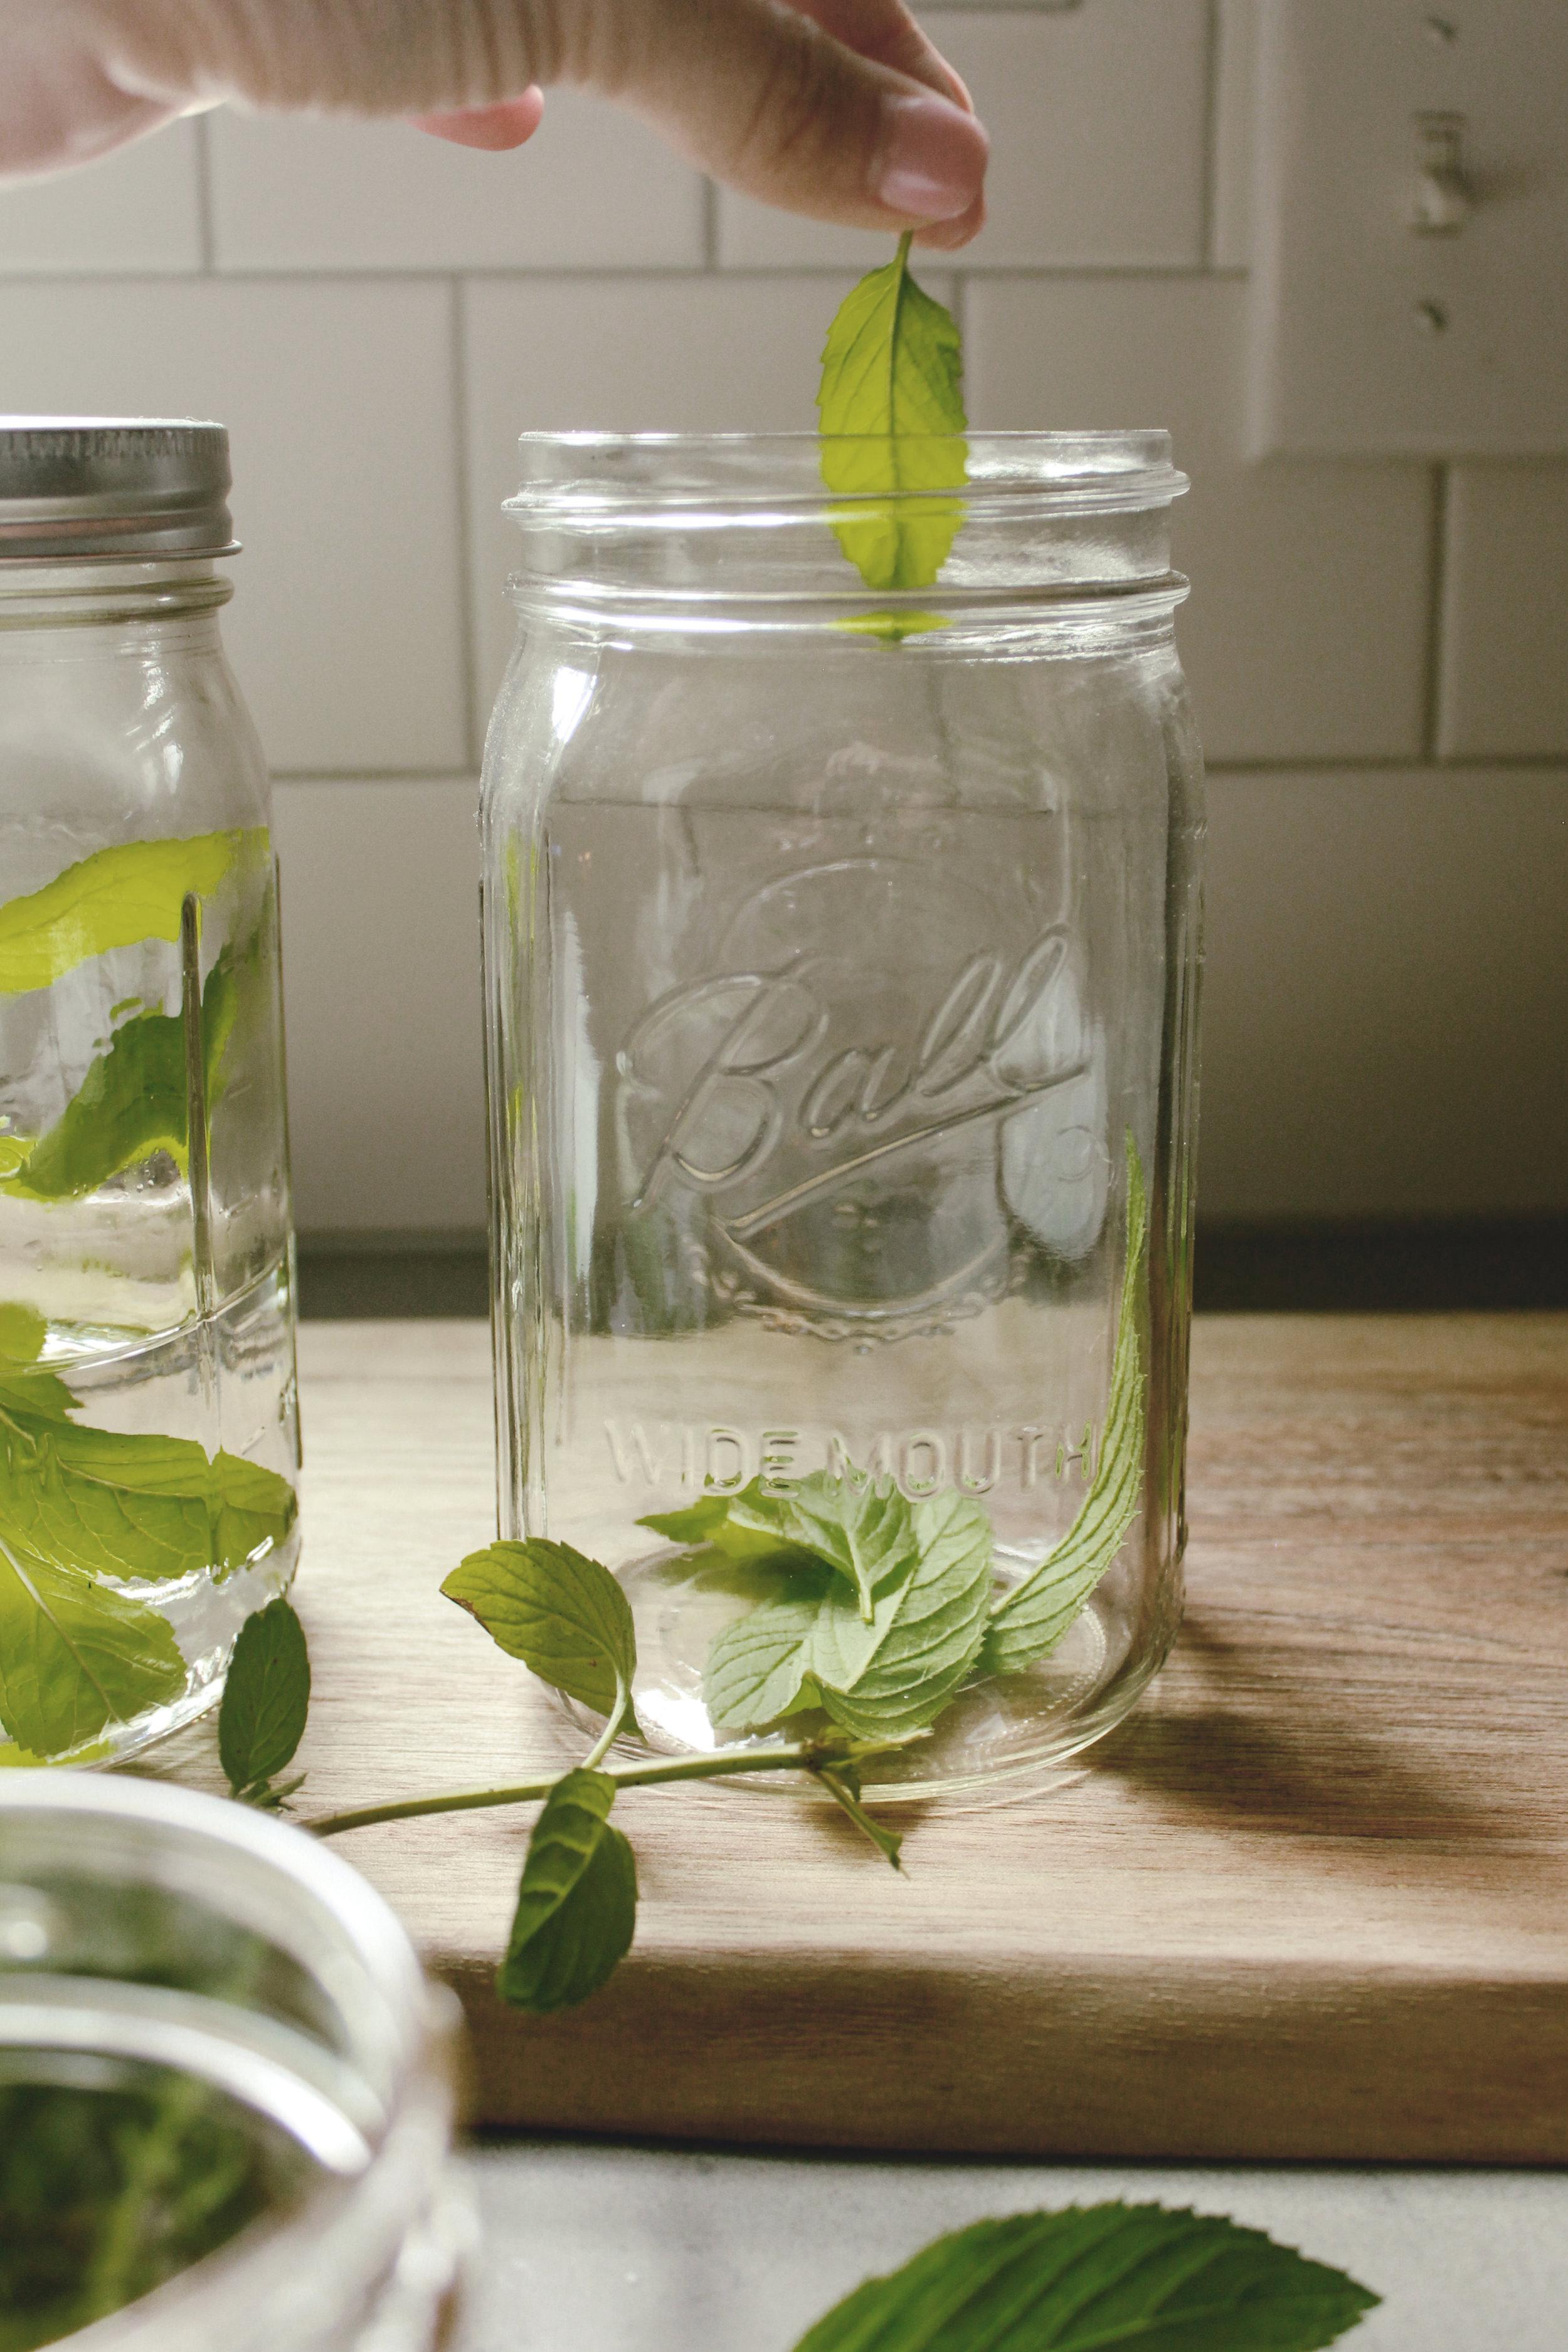 muddling mint leaves for mint juleps / heirloomed